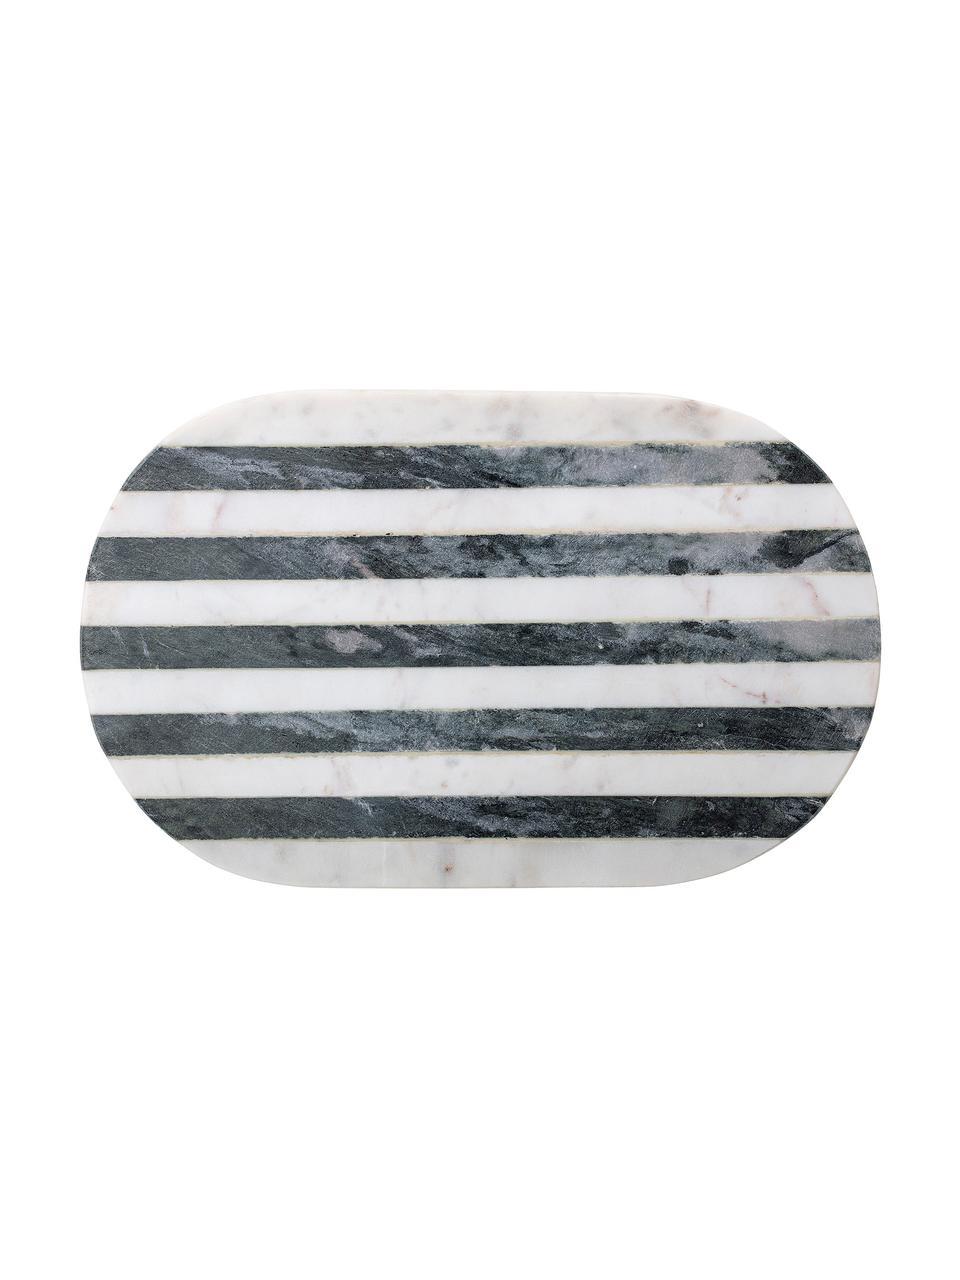 Marmor-Schneidebrett Stripes, B 23 x L 37 cm, Marmor, Schwarz, Weiß, 23 x 37 cm